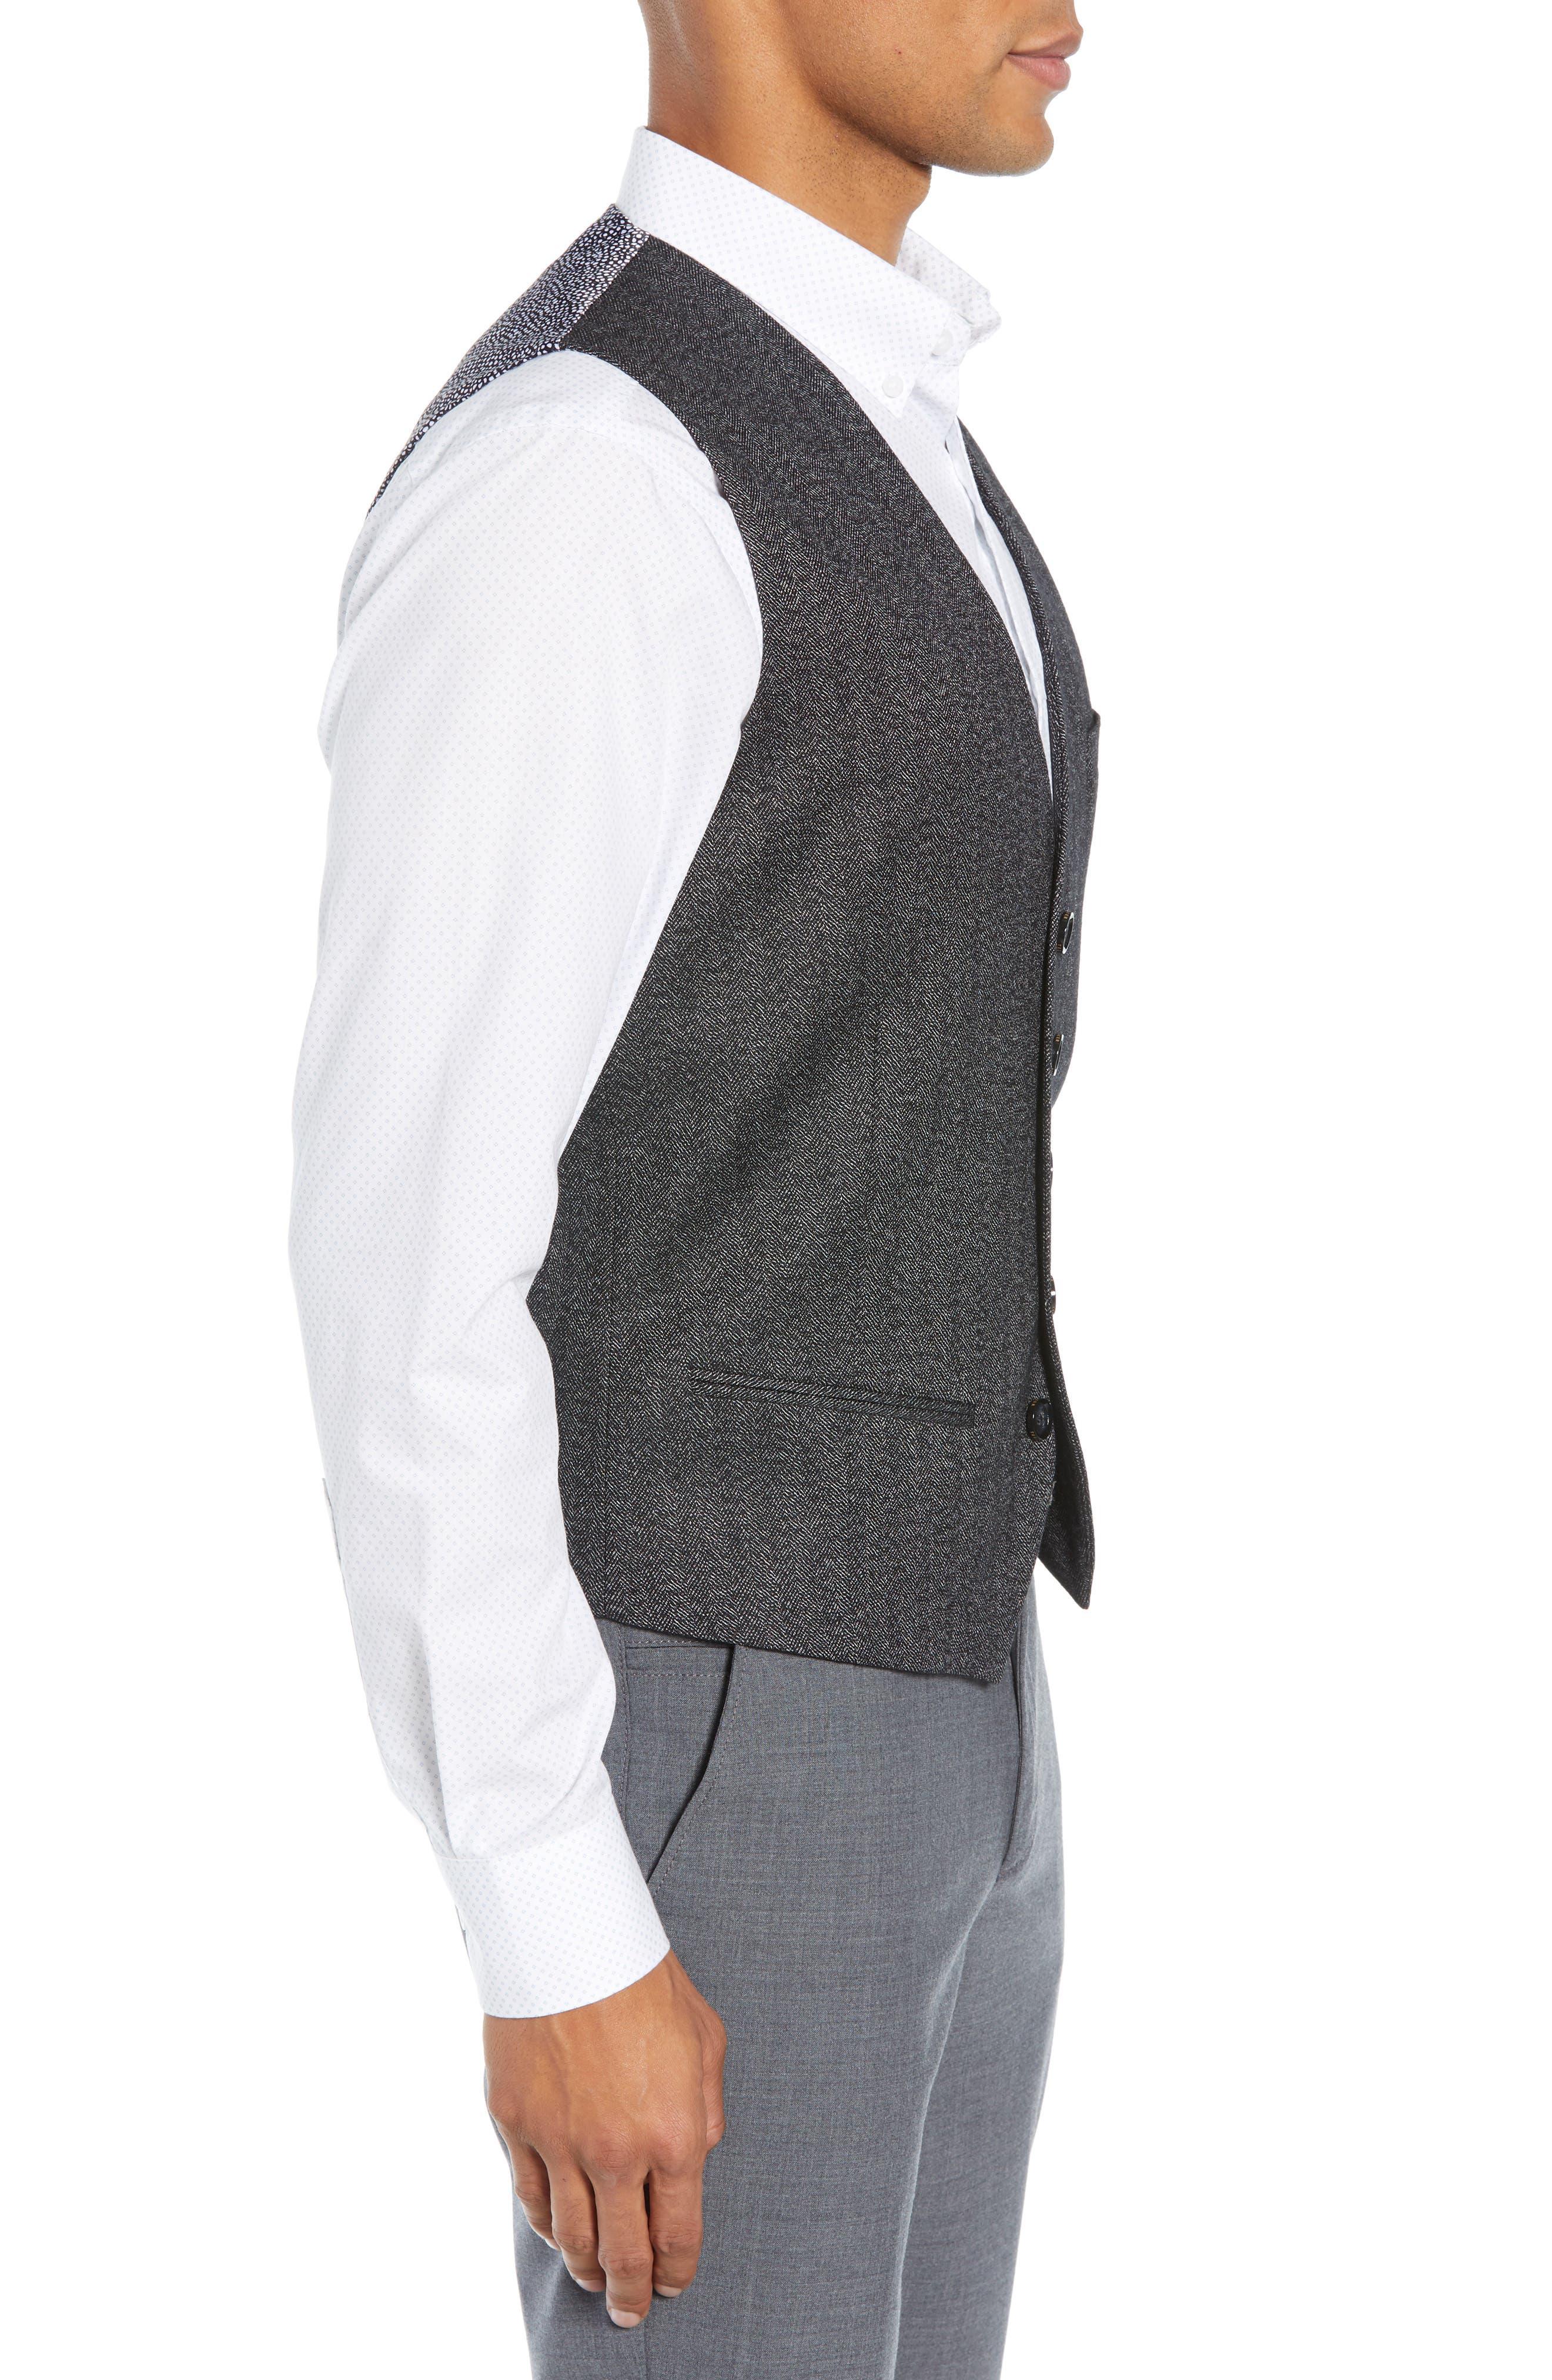 Wenswai Slim Vest,                             Alternate thumbnail 3, color,                             CHARCOAL